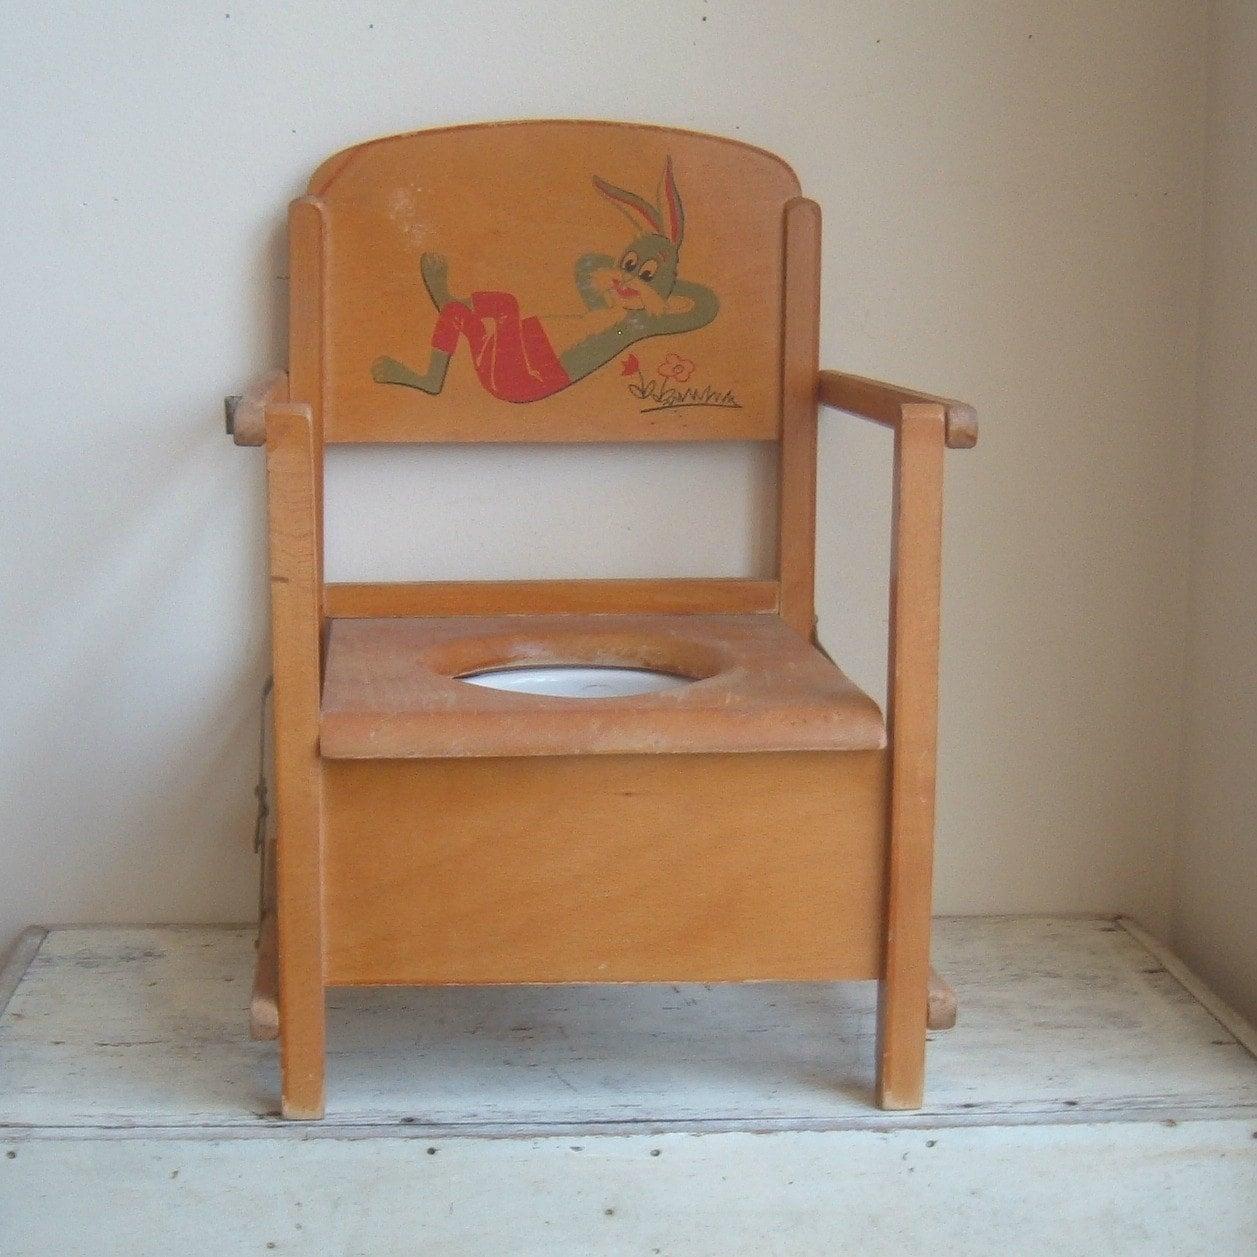 Vintage Child Potty Chair By ImSoVintage On Etsy